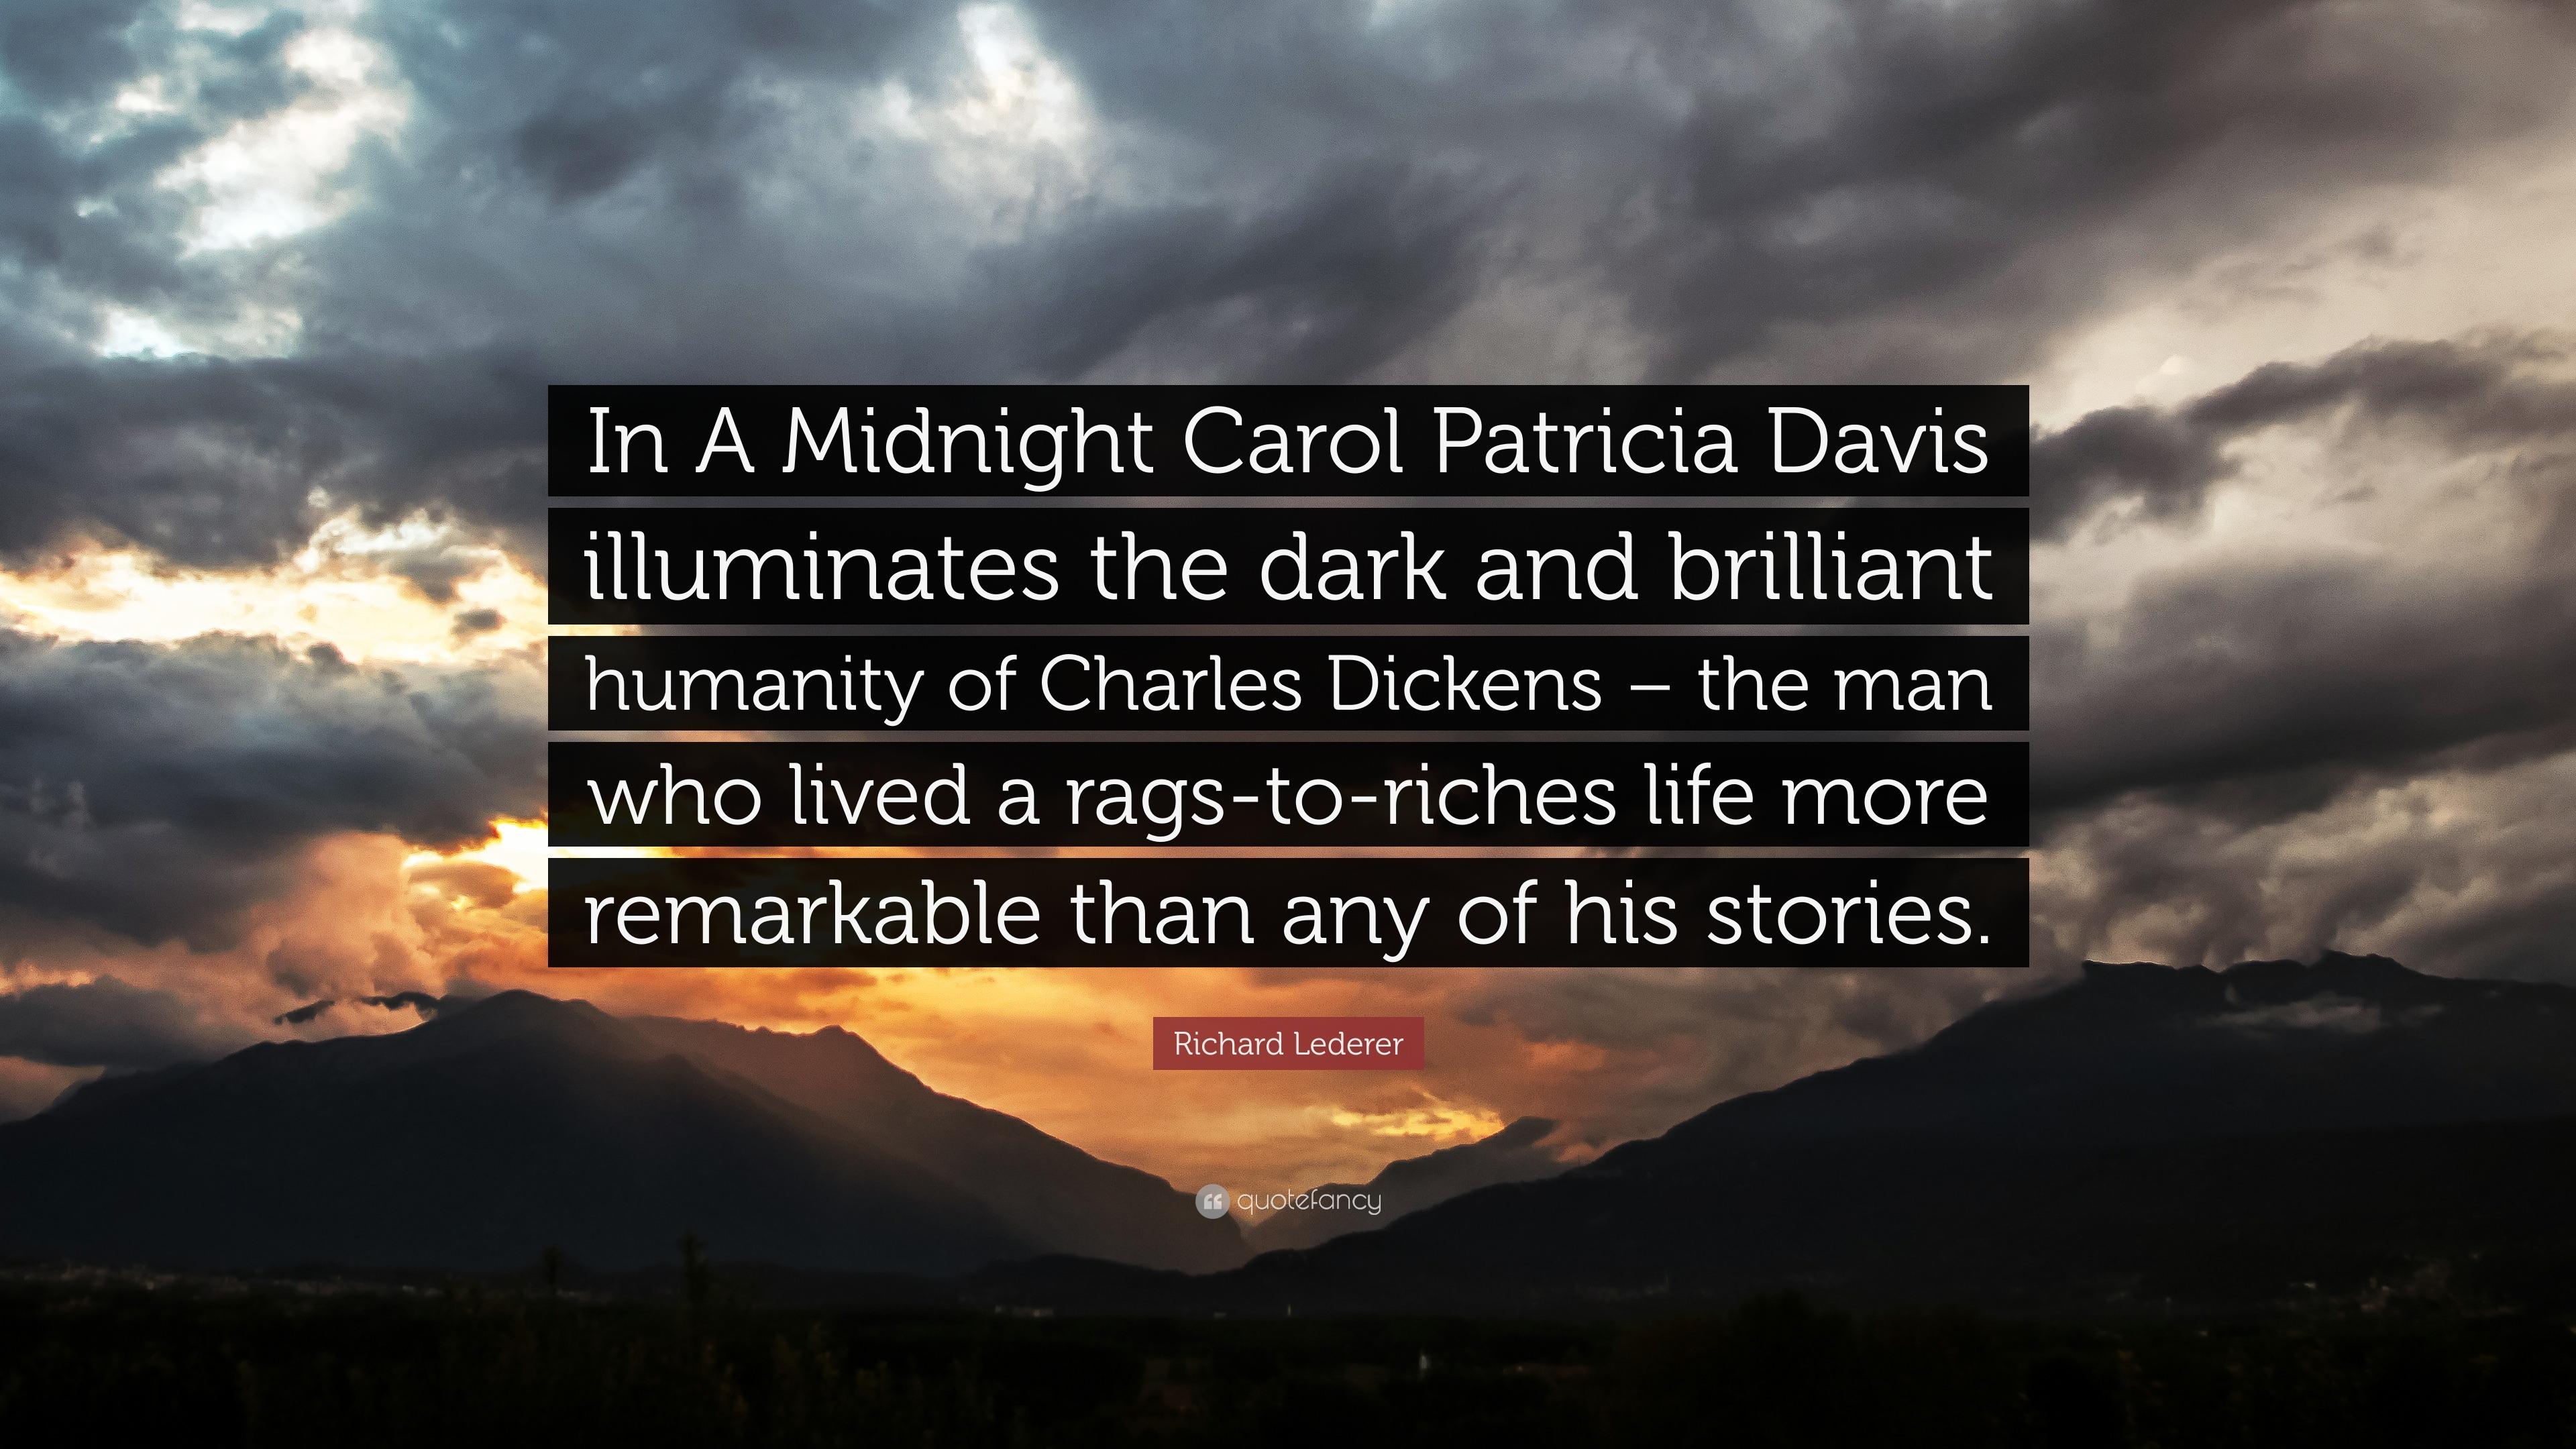 a biography of richard lederer a writer Download ebooks by author richard lederer guaranteed best prices, direct download.